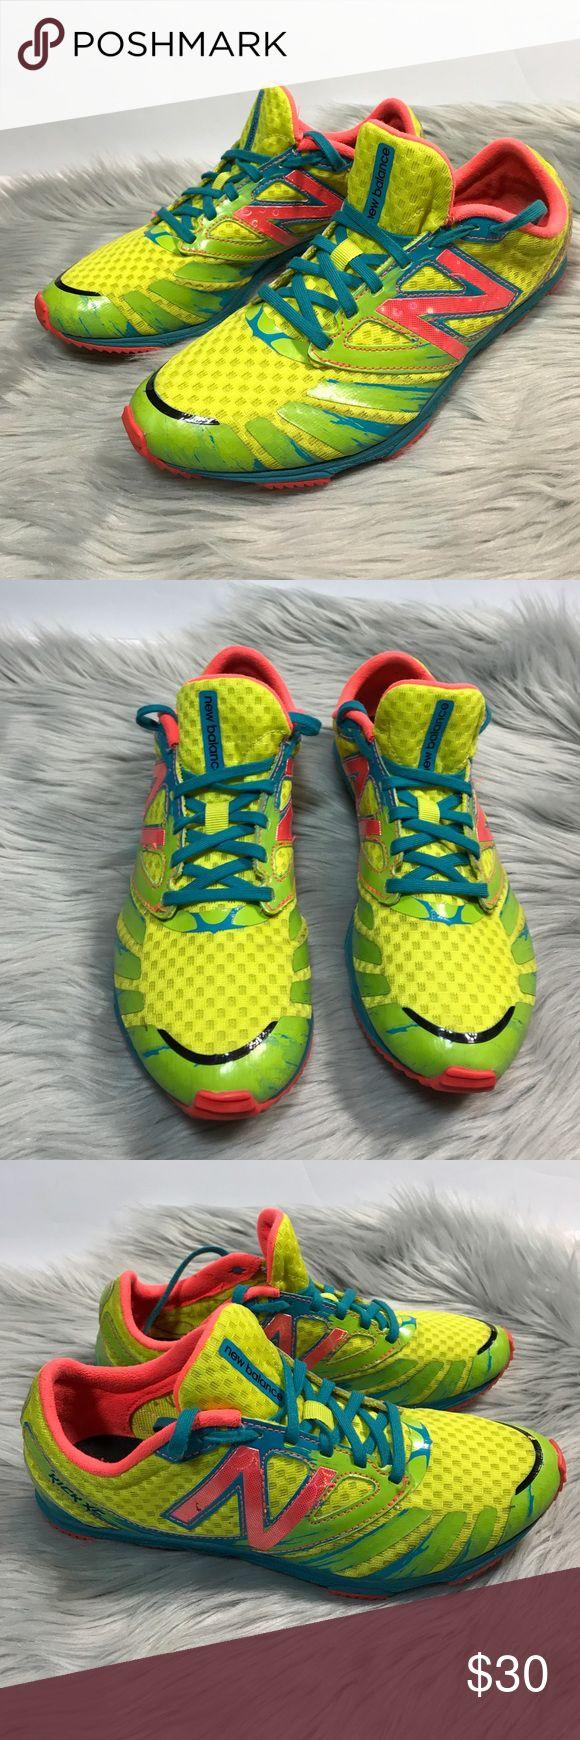 New balance neon running shoes kick XC 700 7.5 EUC women's size 7.5 New Balance Shoes Sneakers